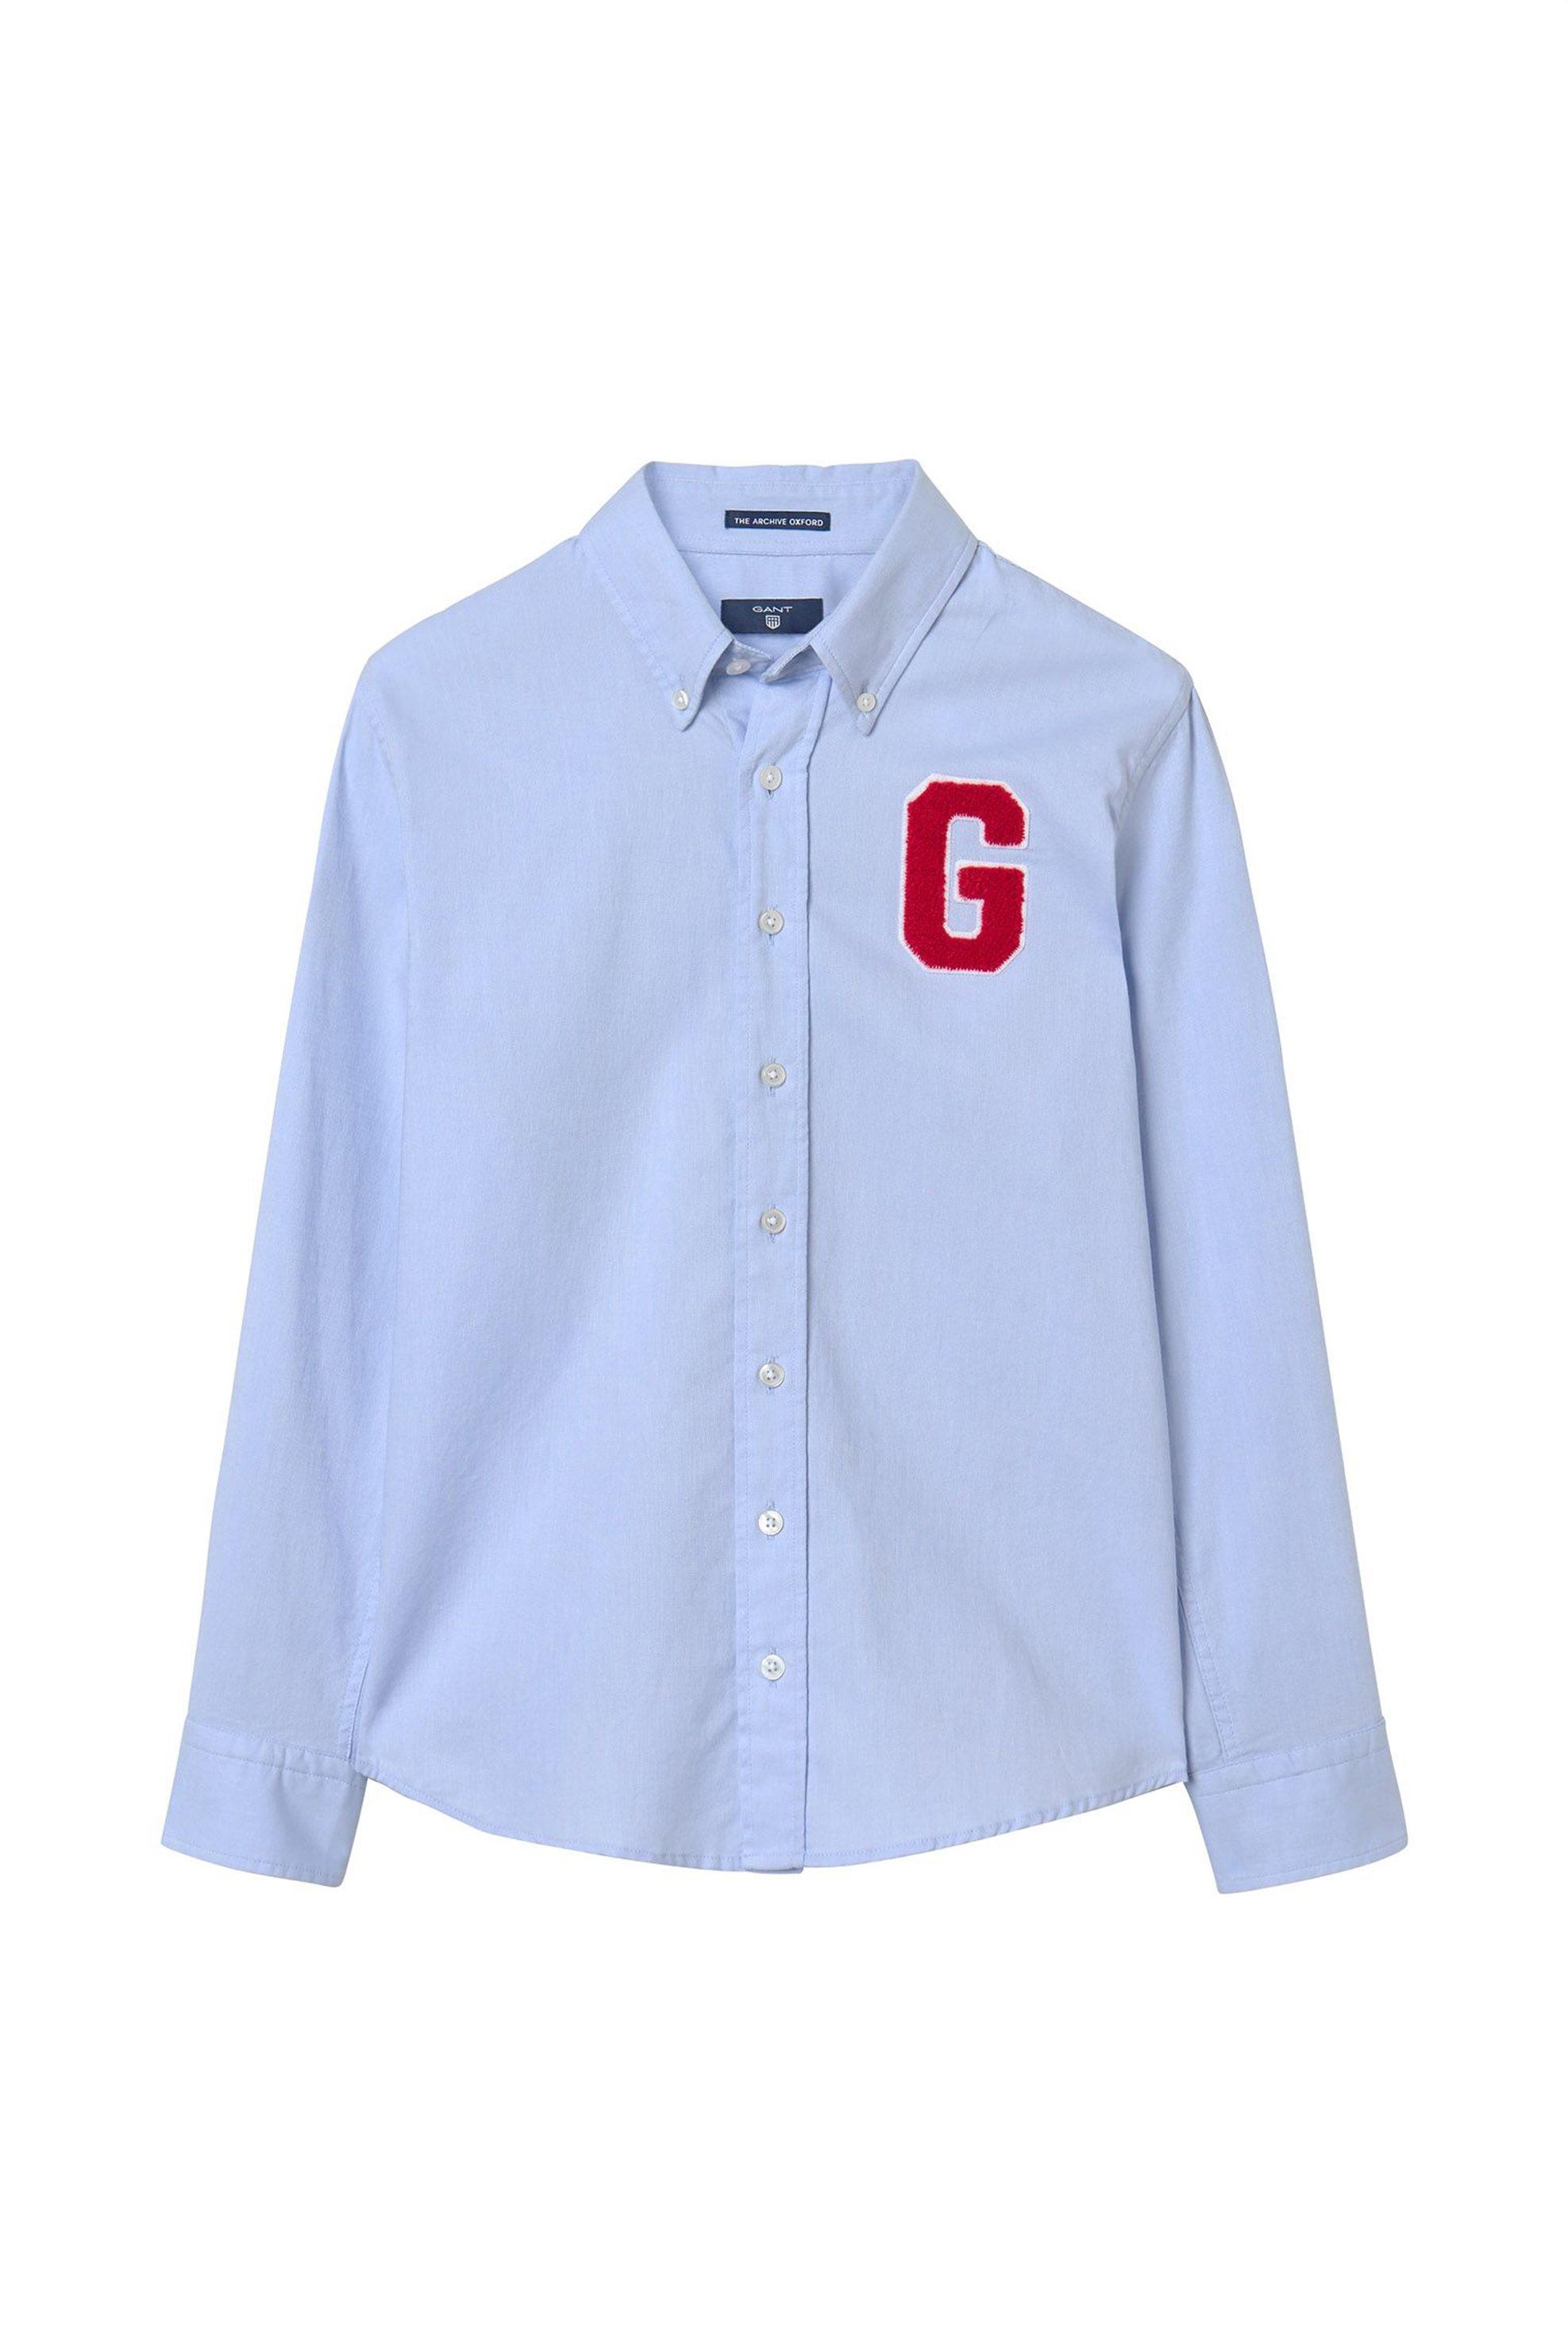 a5d2b0d0433c Notos Παιδικό πουκάμισο Archive Oxford Badges GANT - 930377 - Γαλάζιο